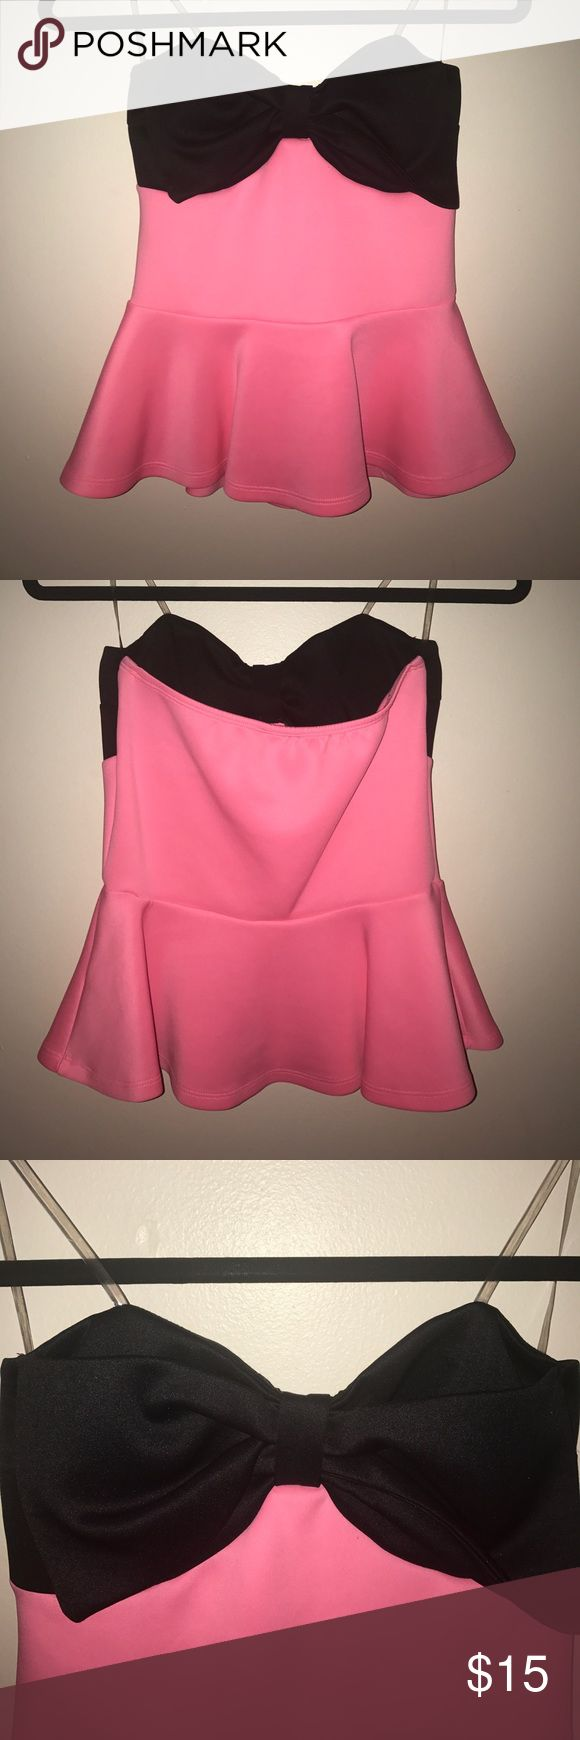 Sleeveless Pink and Black Peplum Top Sleeveless, pink peplum top with a black bow at the top. Great material. Society Girl Tops